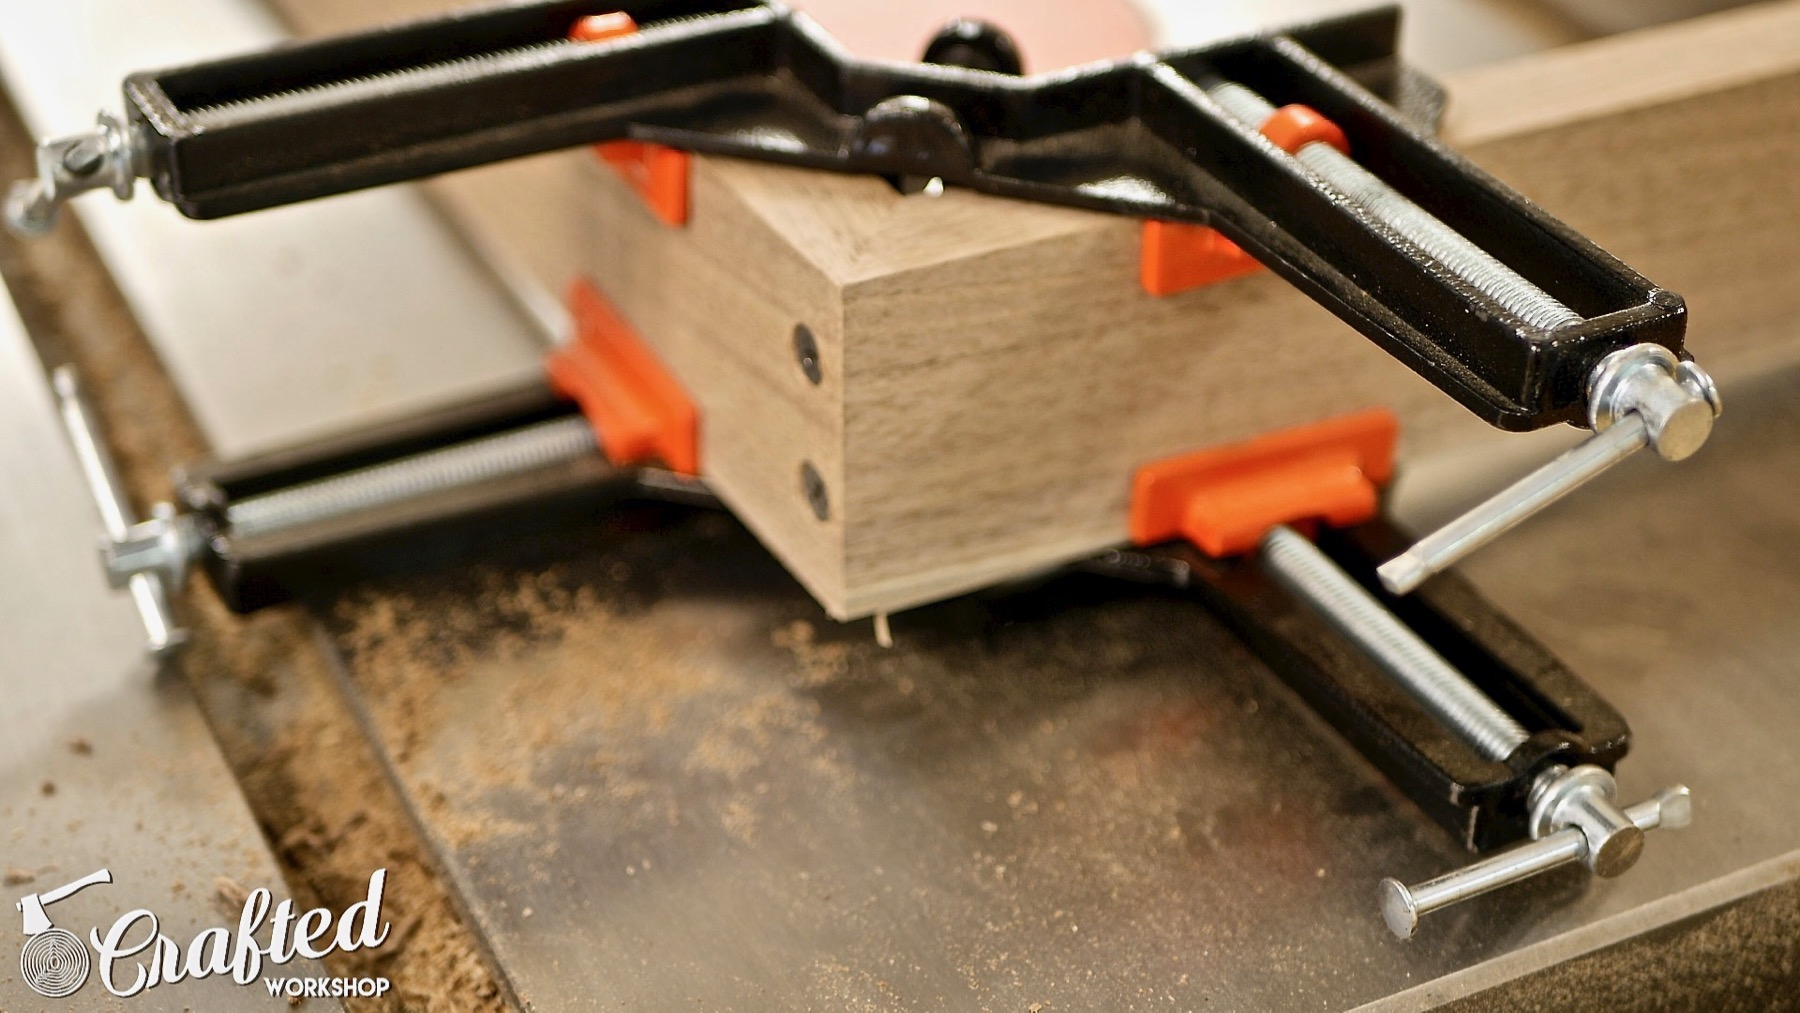 DIY Light Box Sign How-To Build countersink screws corner clamps